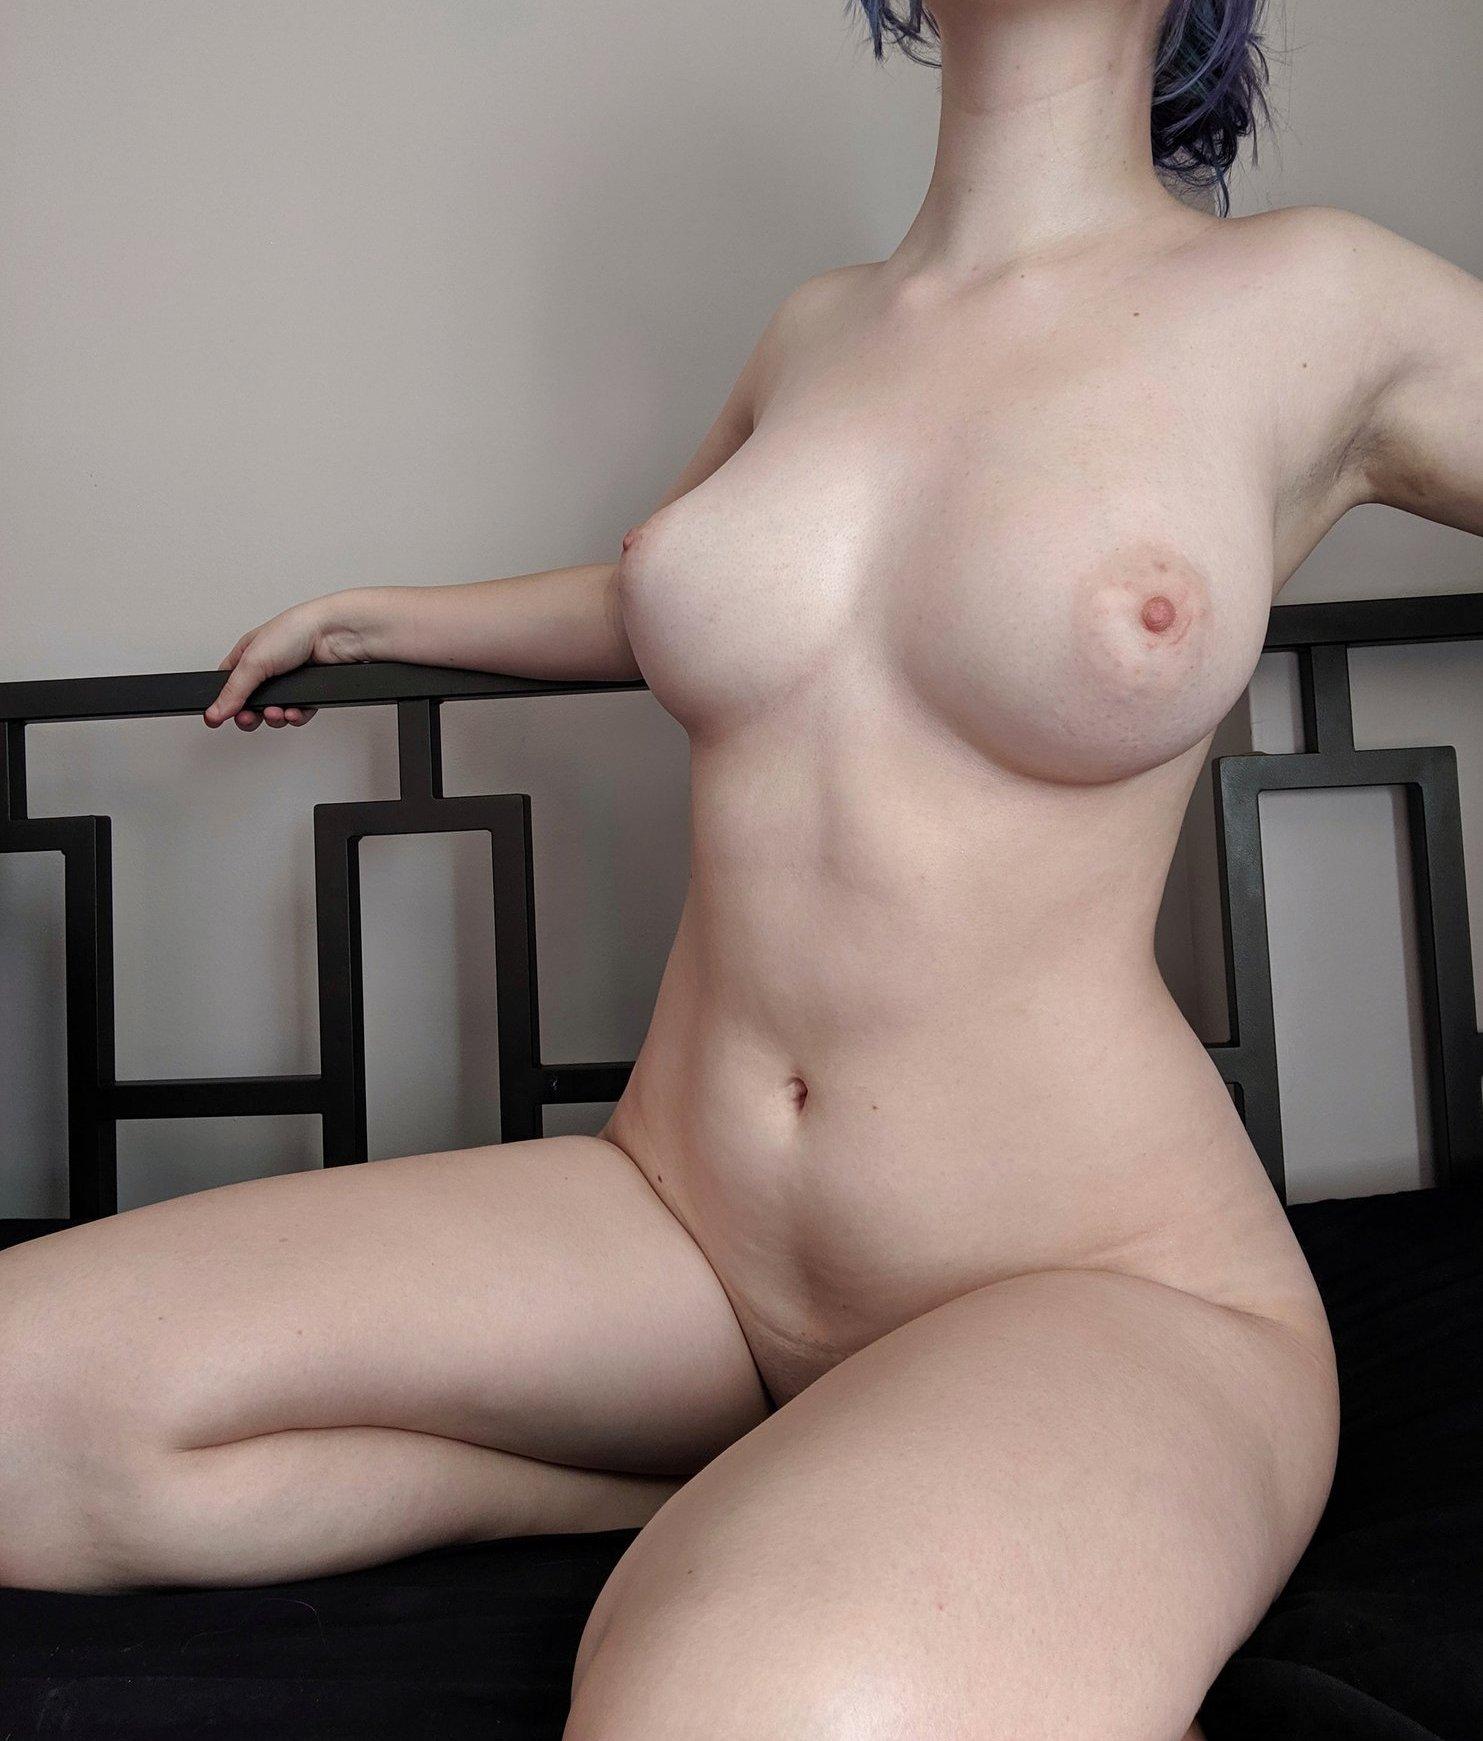 Sendeyed Others Nude Leaks 0012